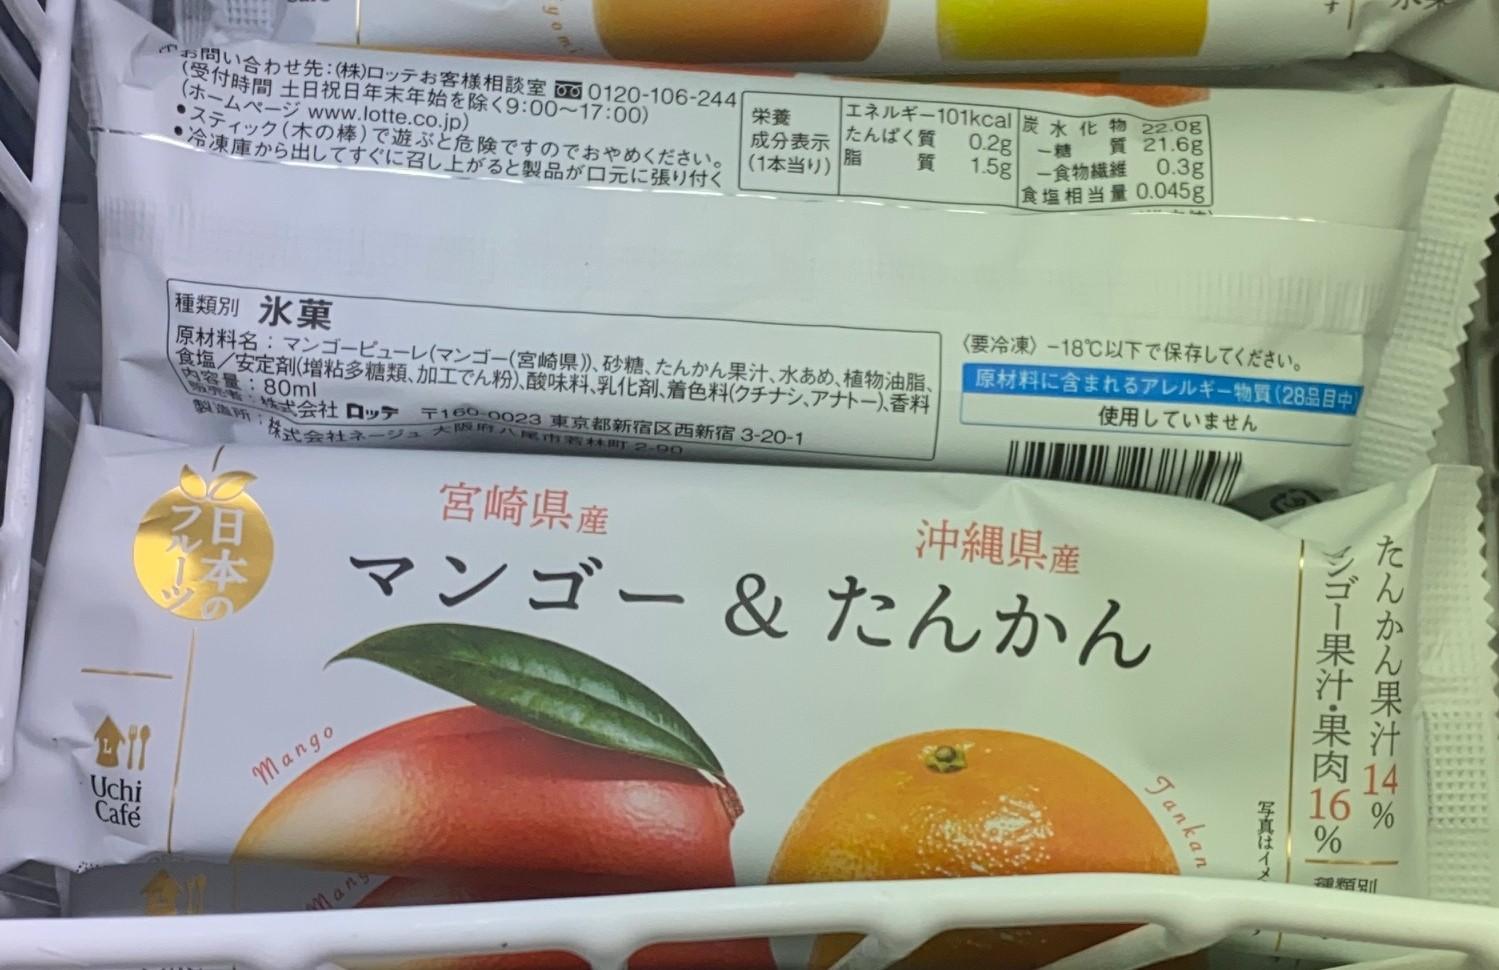 Lawson Uchi Cafe Japanese Fruits Mango & Tankan